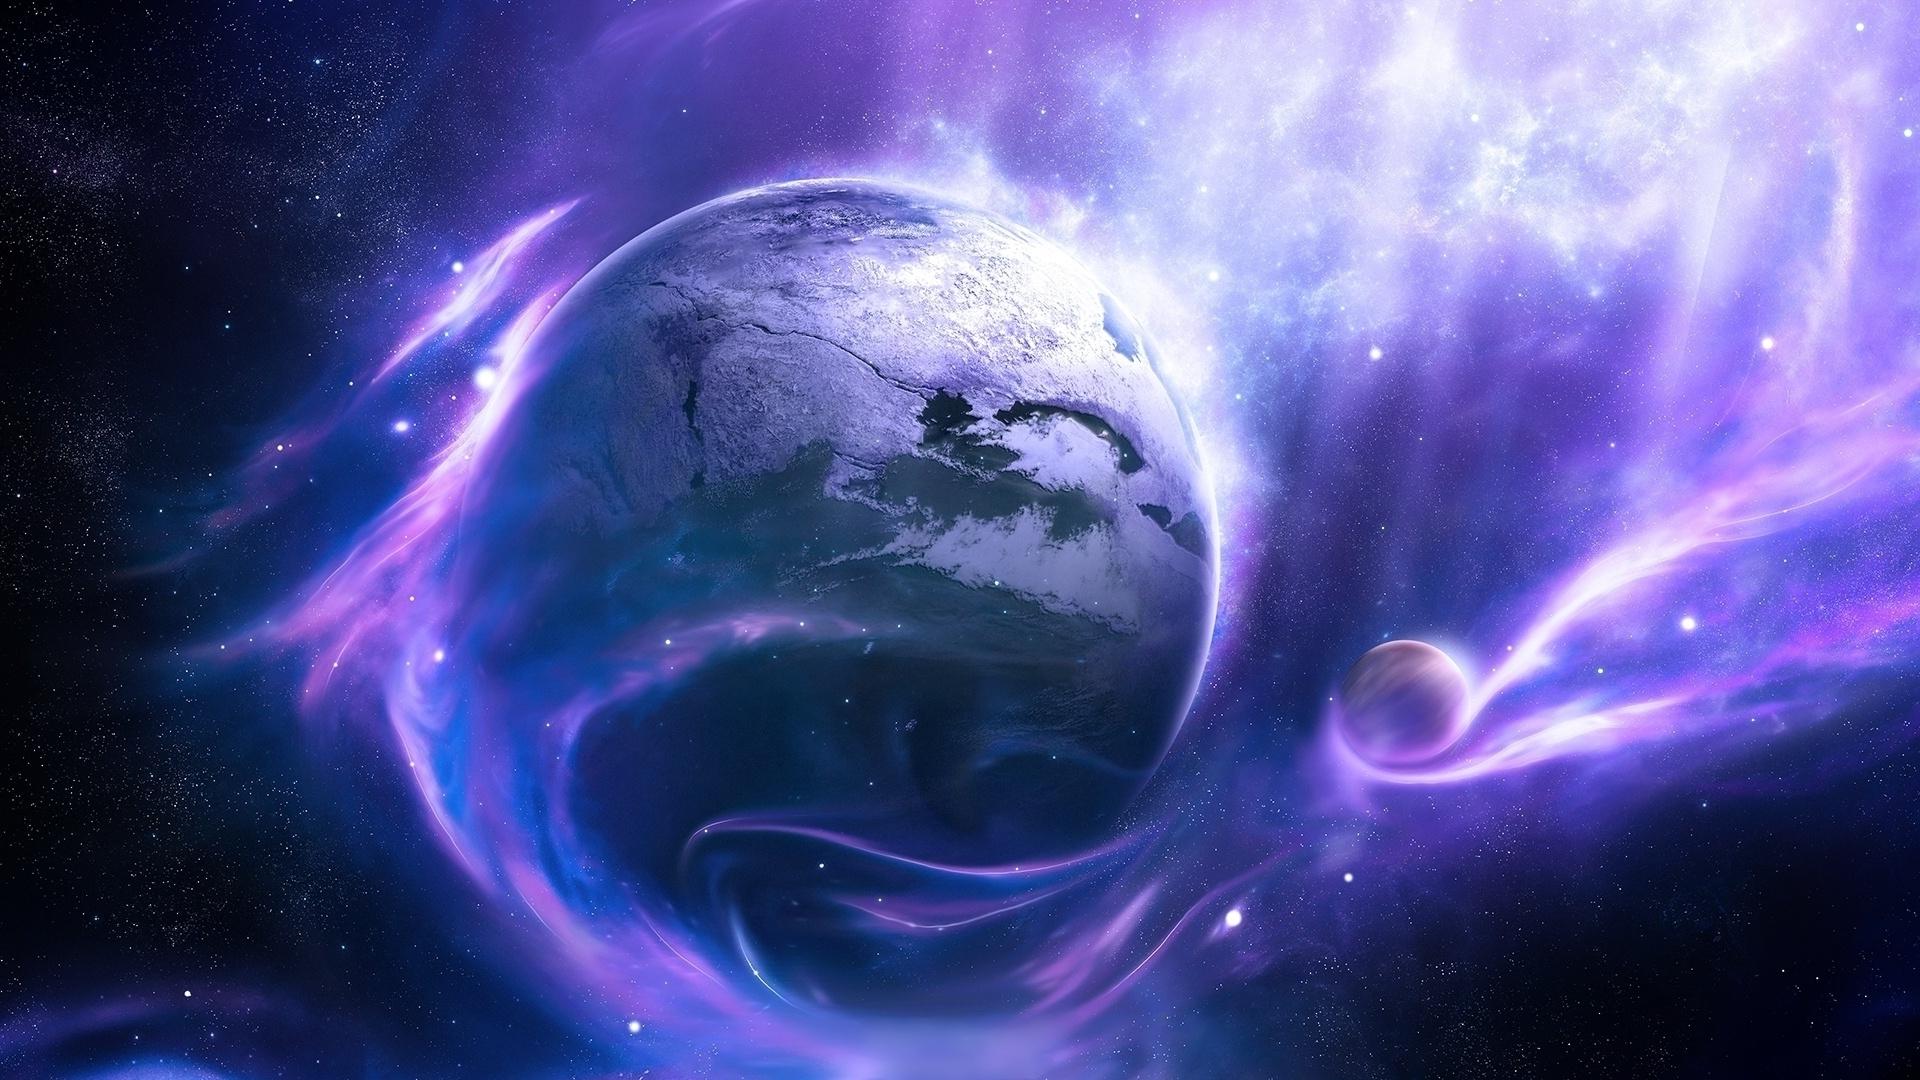 Purple galaxy wallpaper #26081